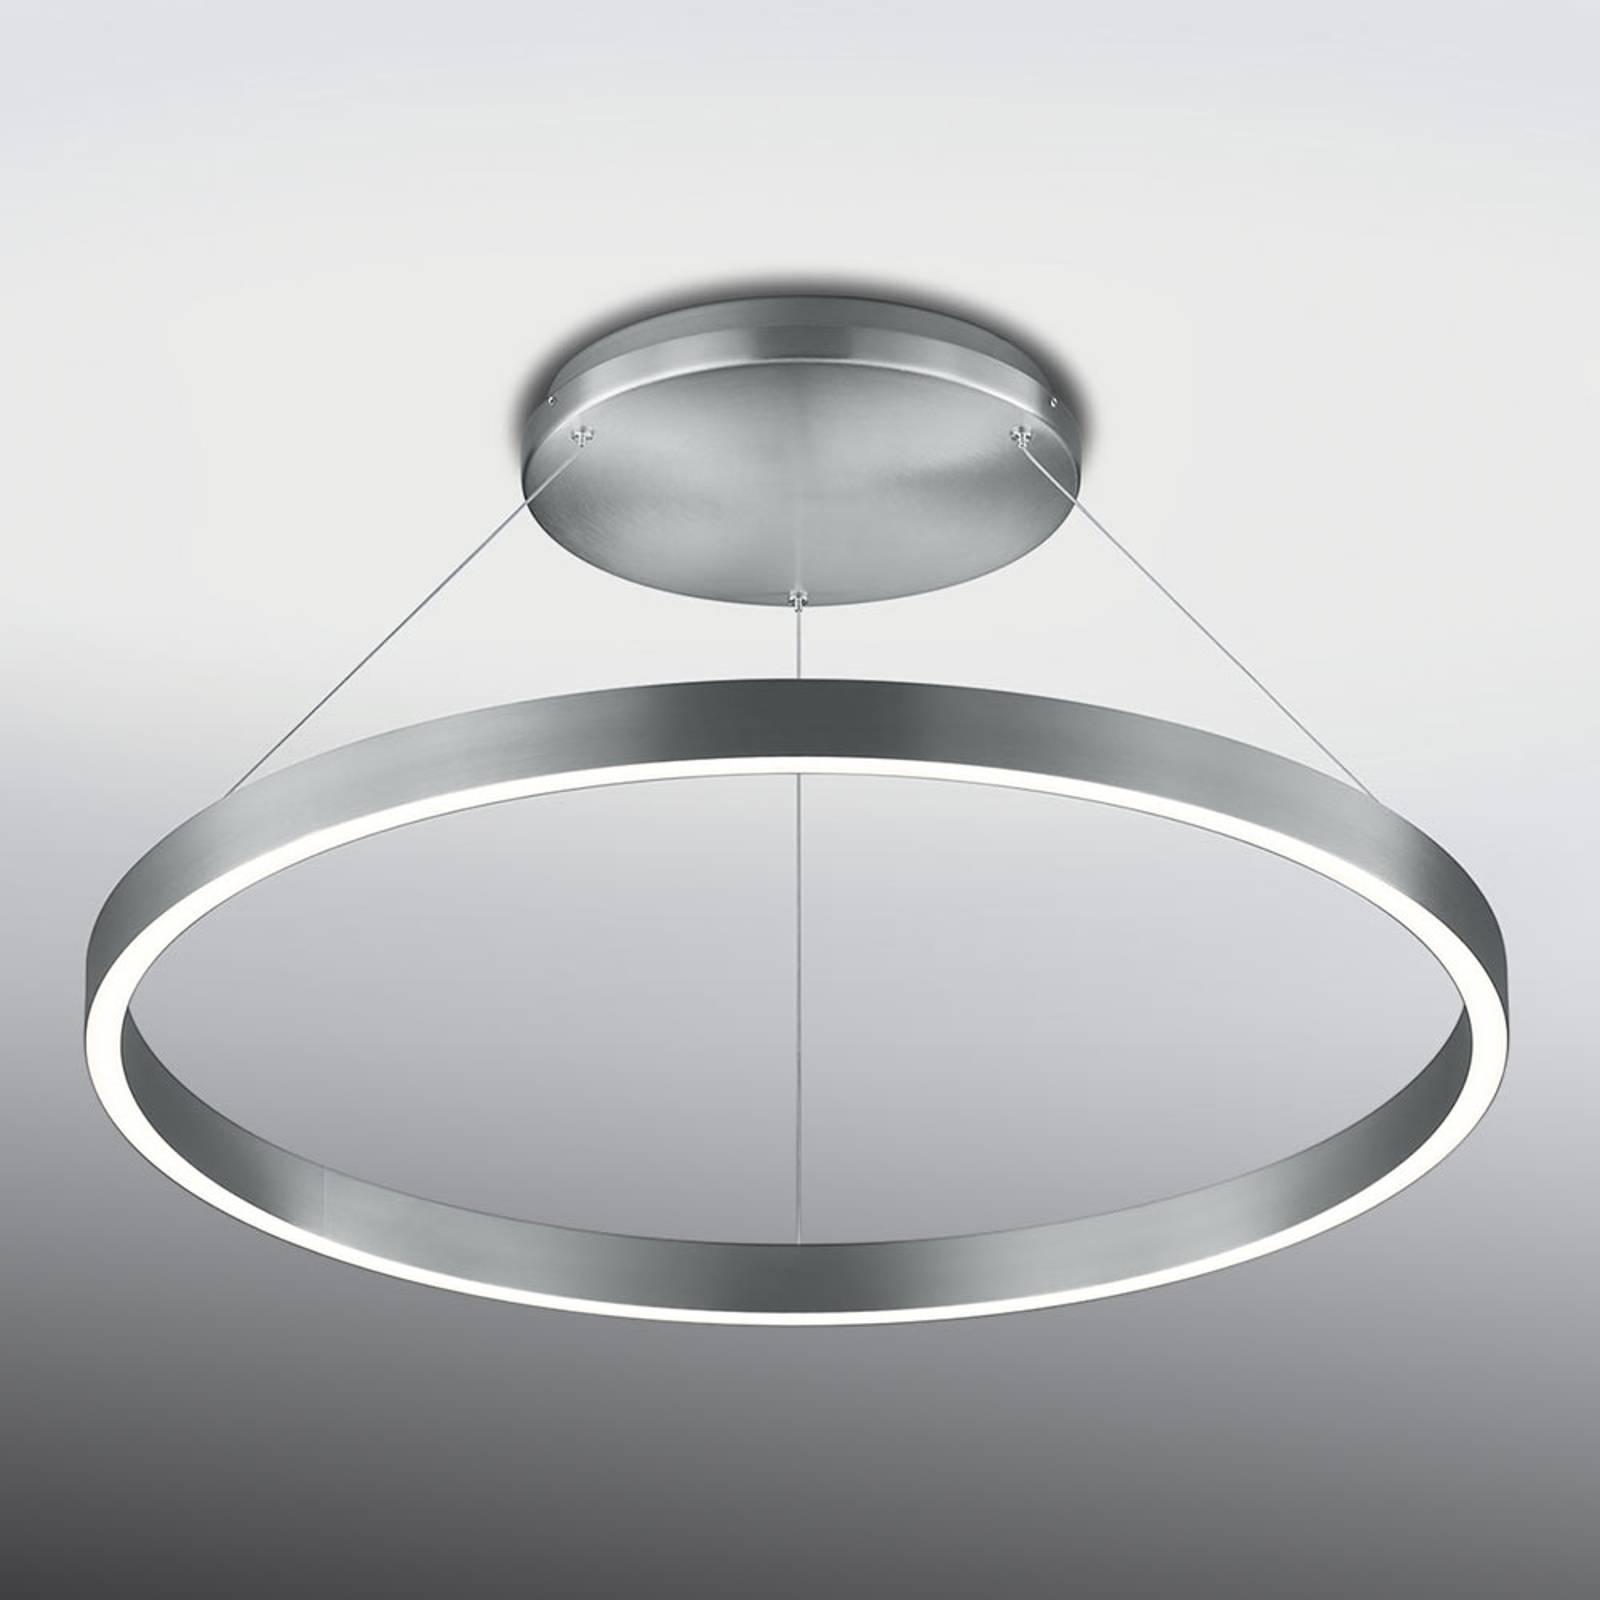 Ringförmige LED-Deckenleuchte Circle - dimmbar